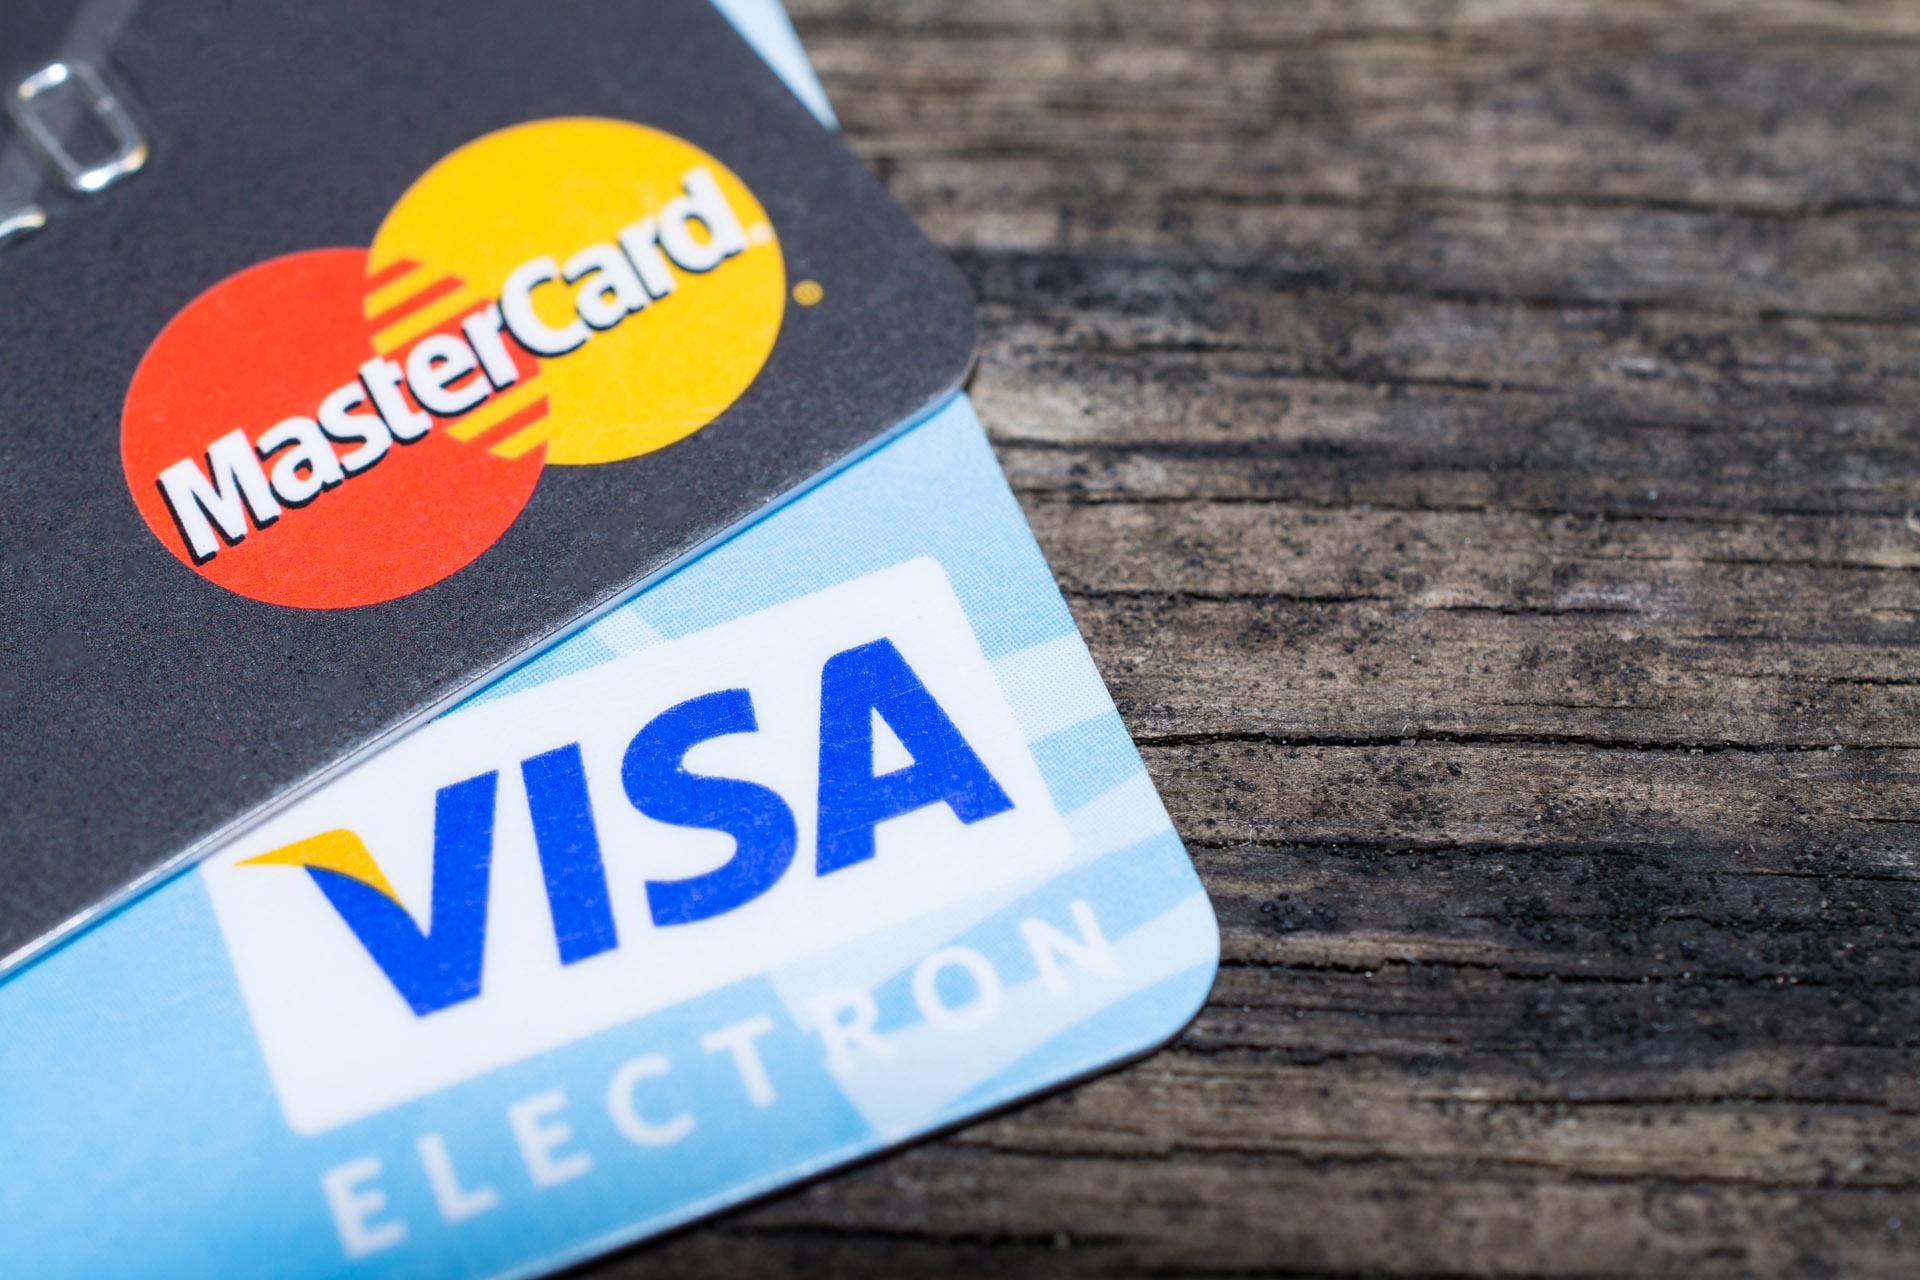 visa mastercard credit card